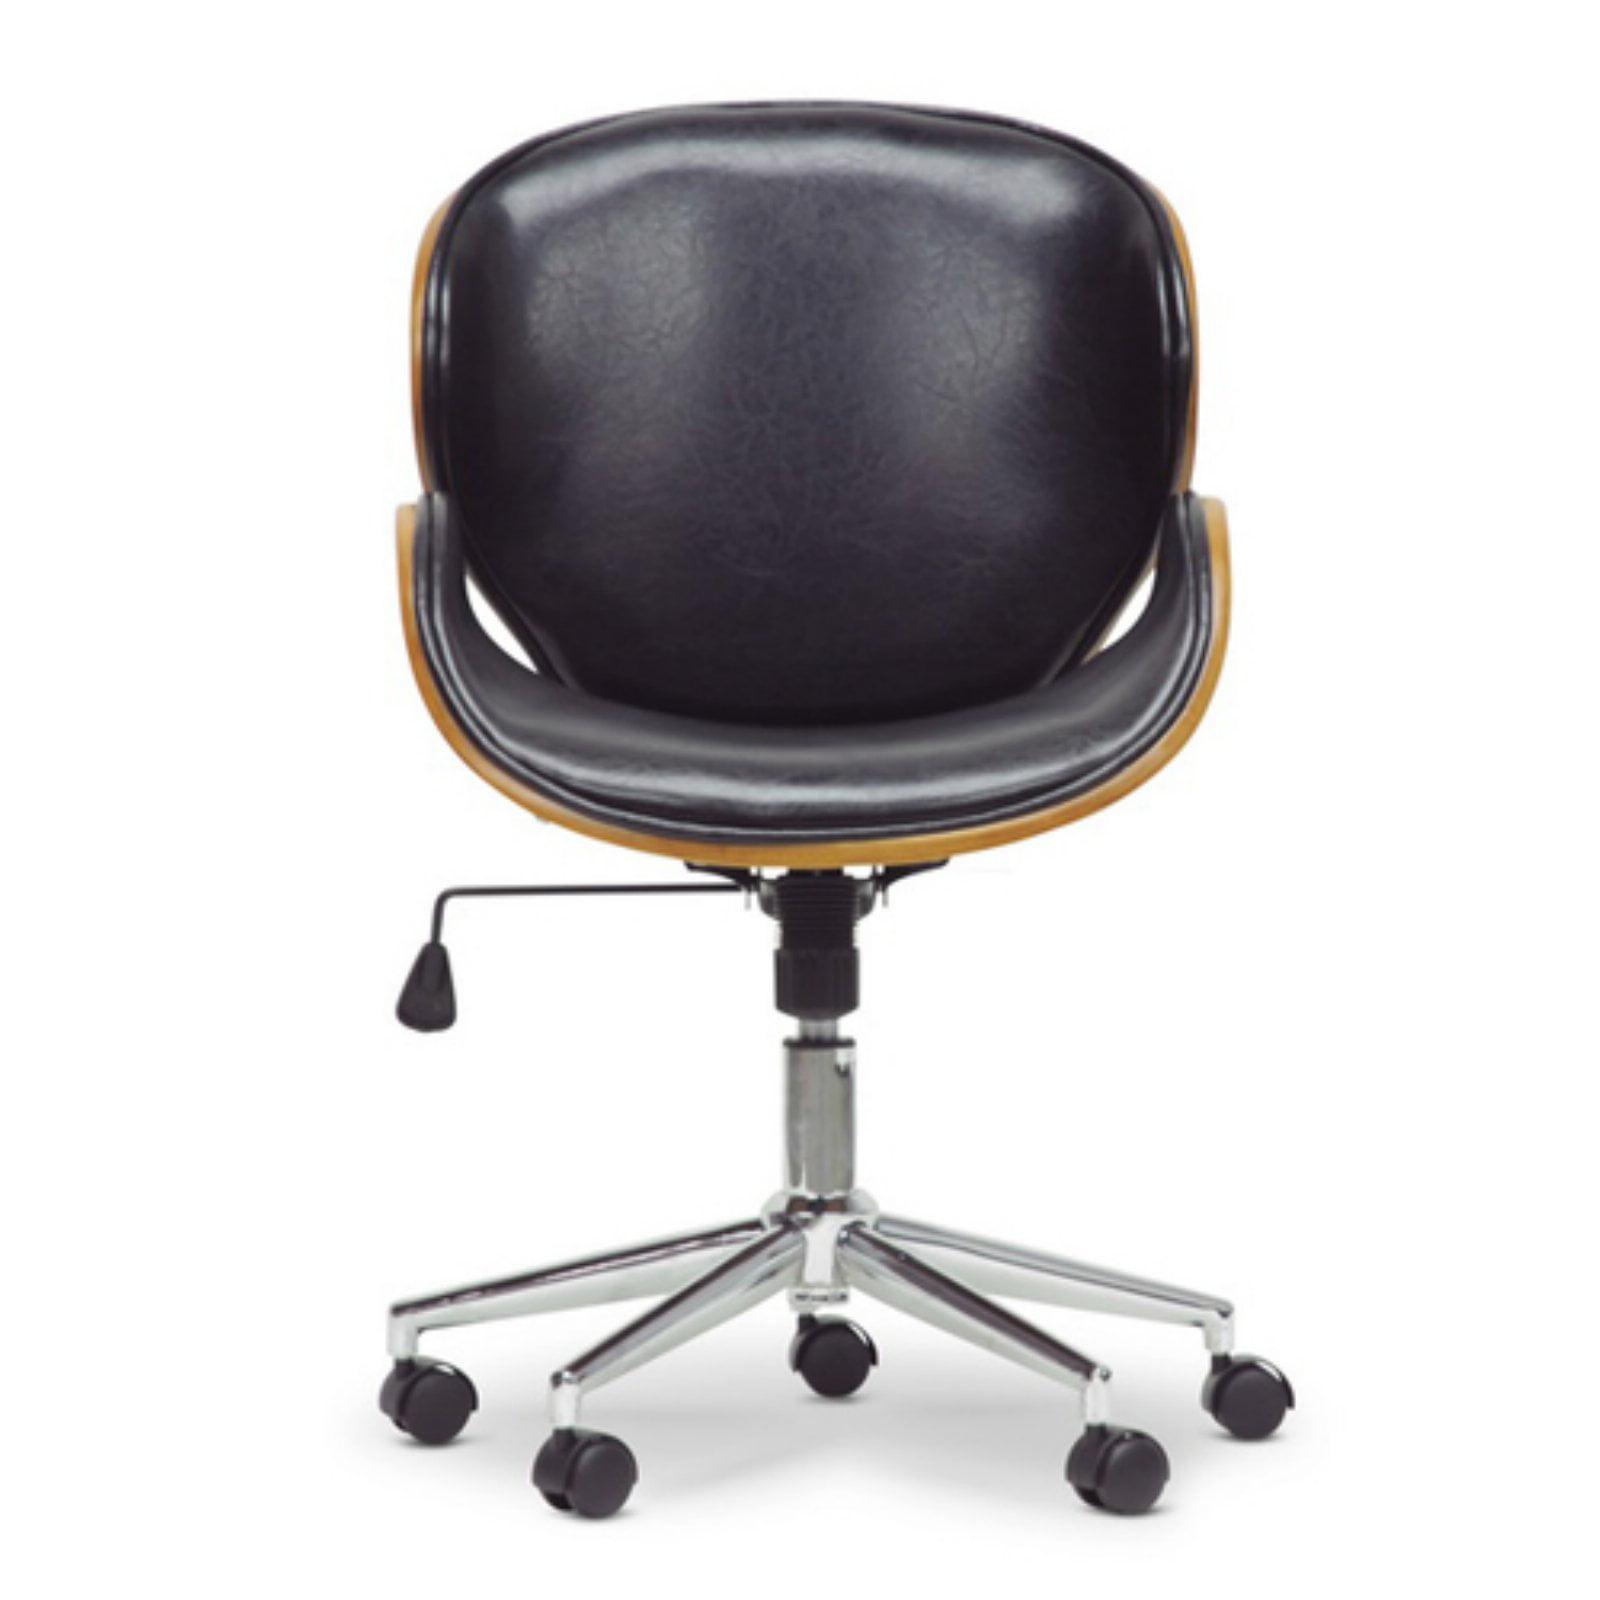 Marvelous Bruce Walnut And Black Modern Office Chair Interior Design Ideas Gentotryabchikinfo